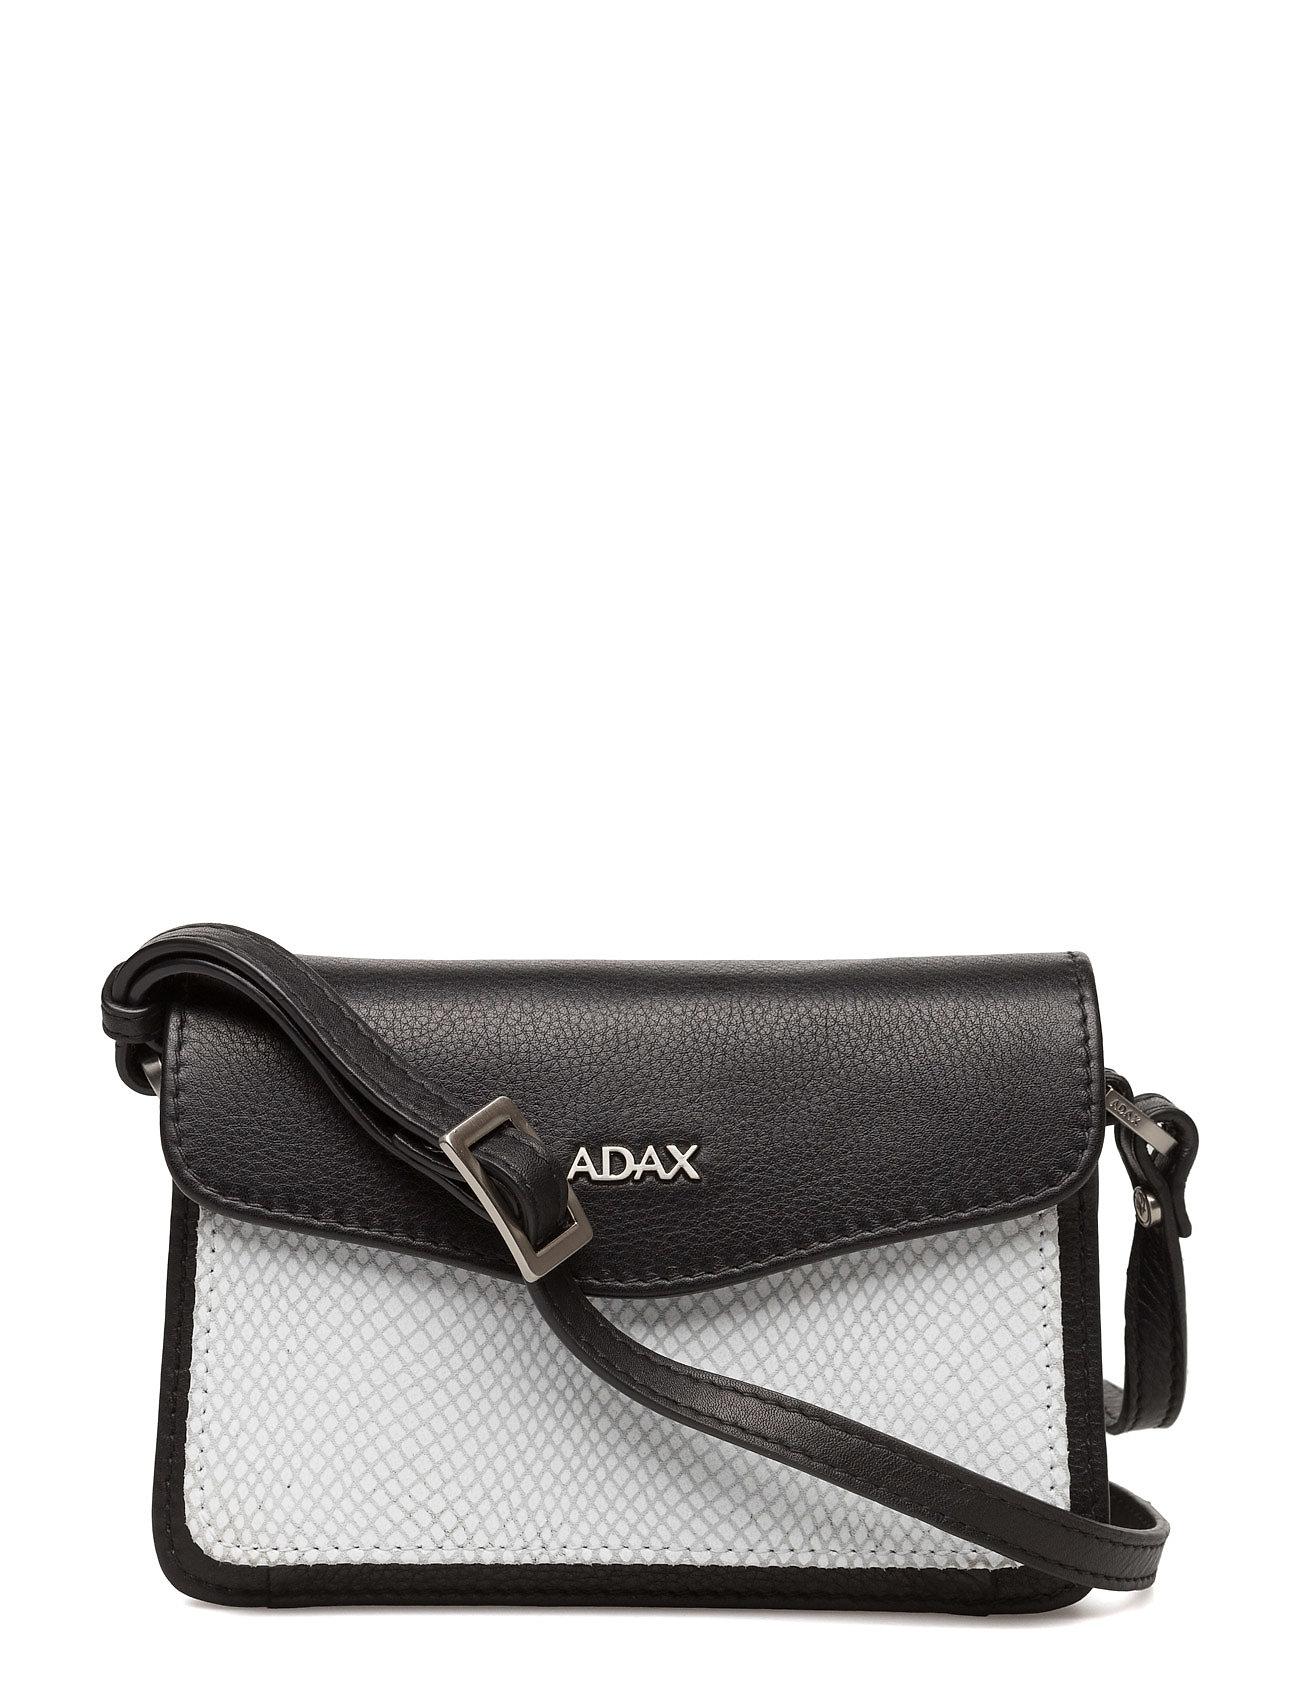 adax – Modena shoulder bag kristin på boozt.com dk